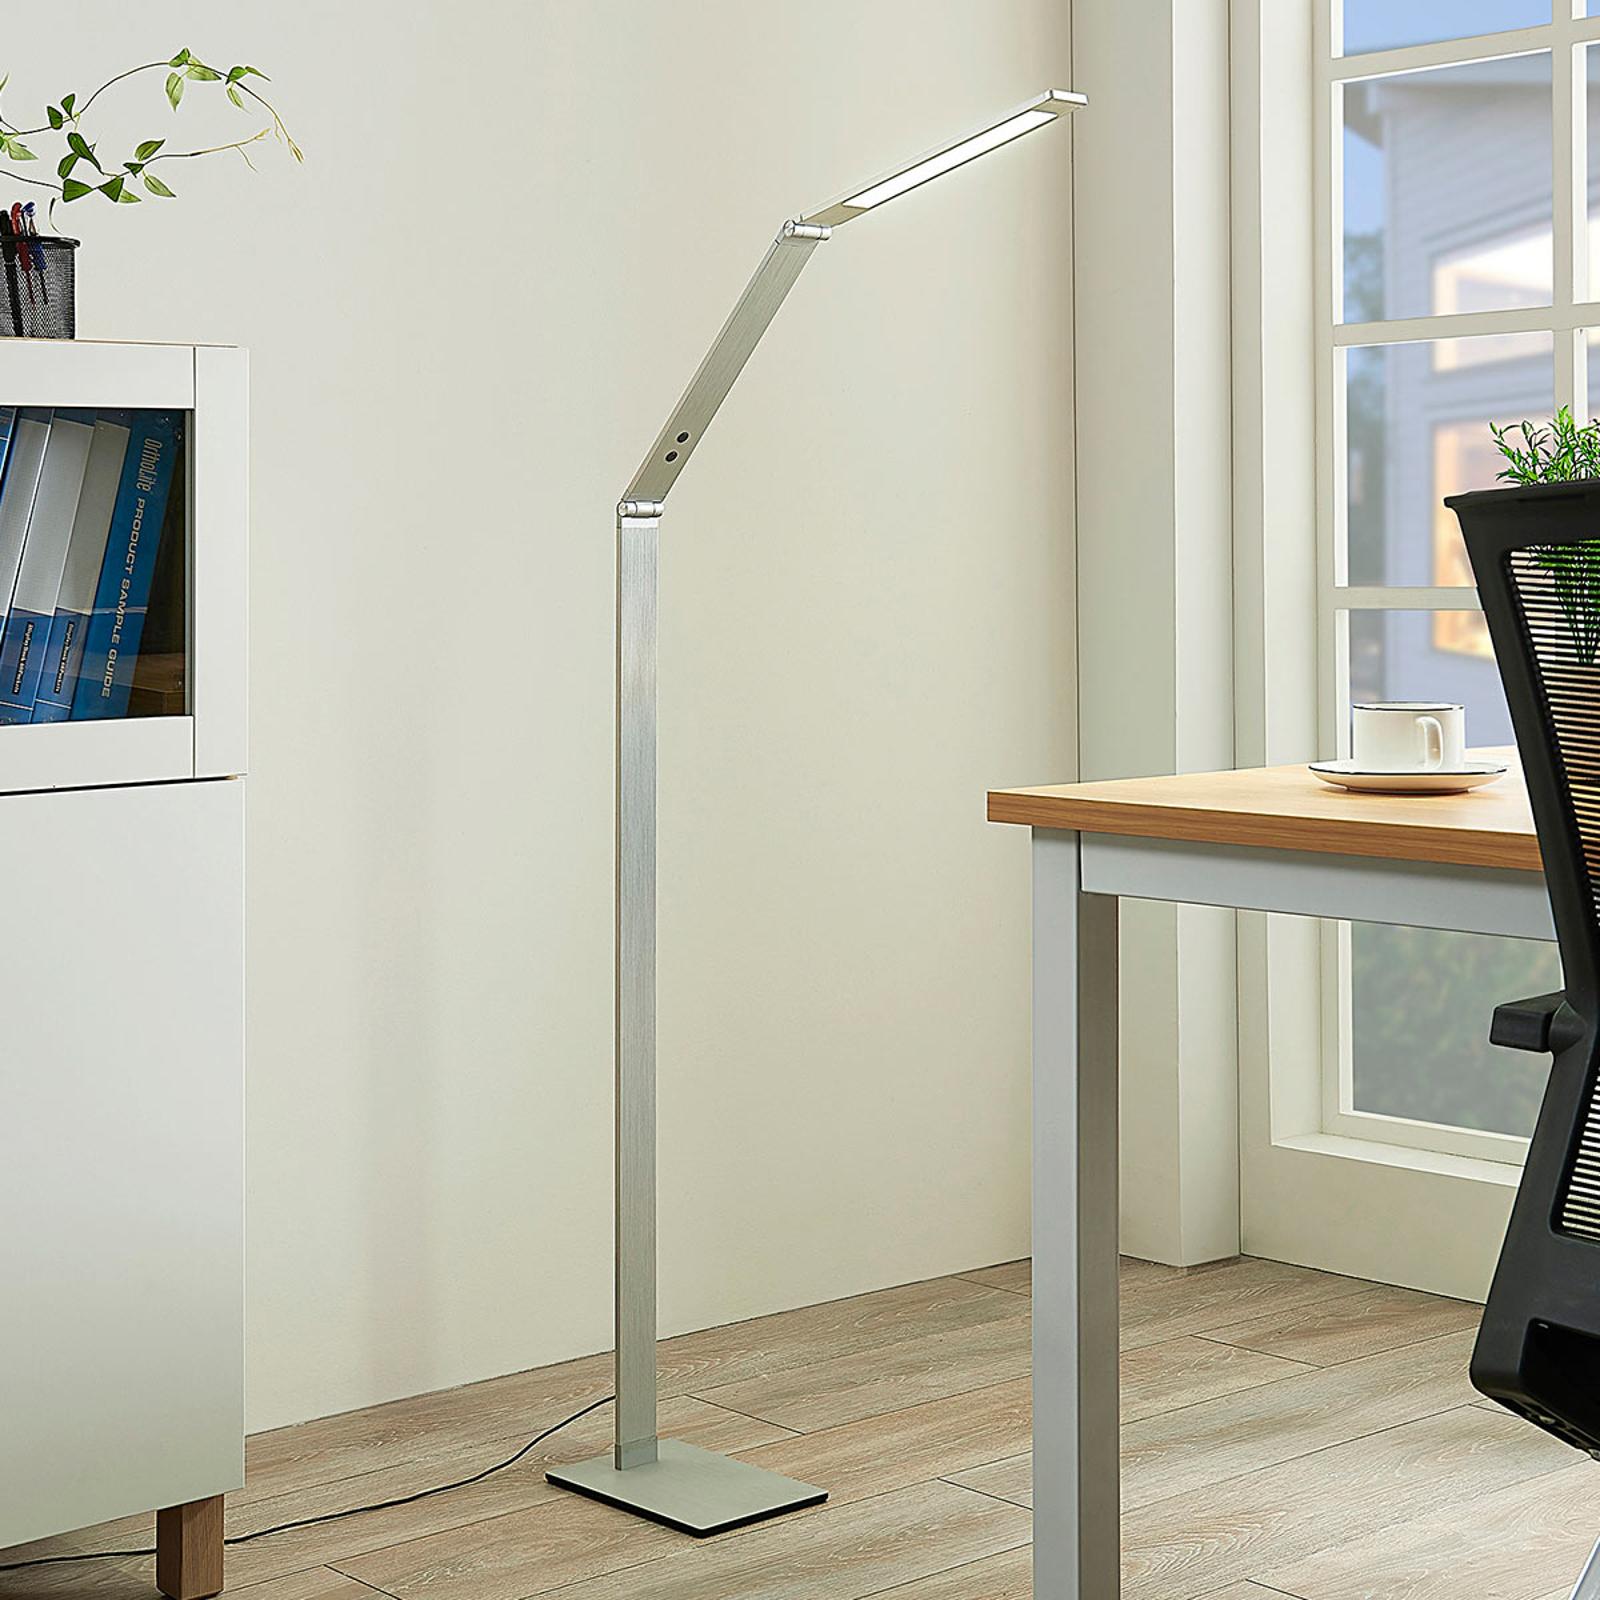 Lampada a LED da lettura Nicano a colore variabile